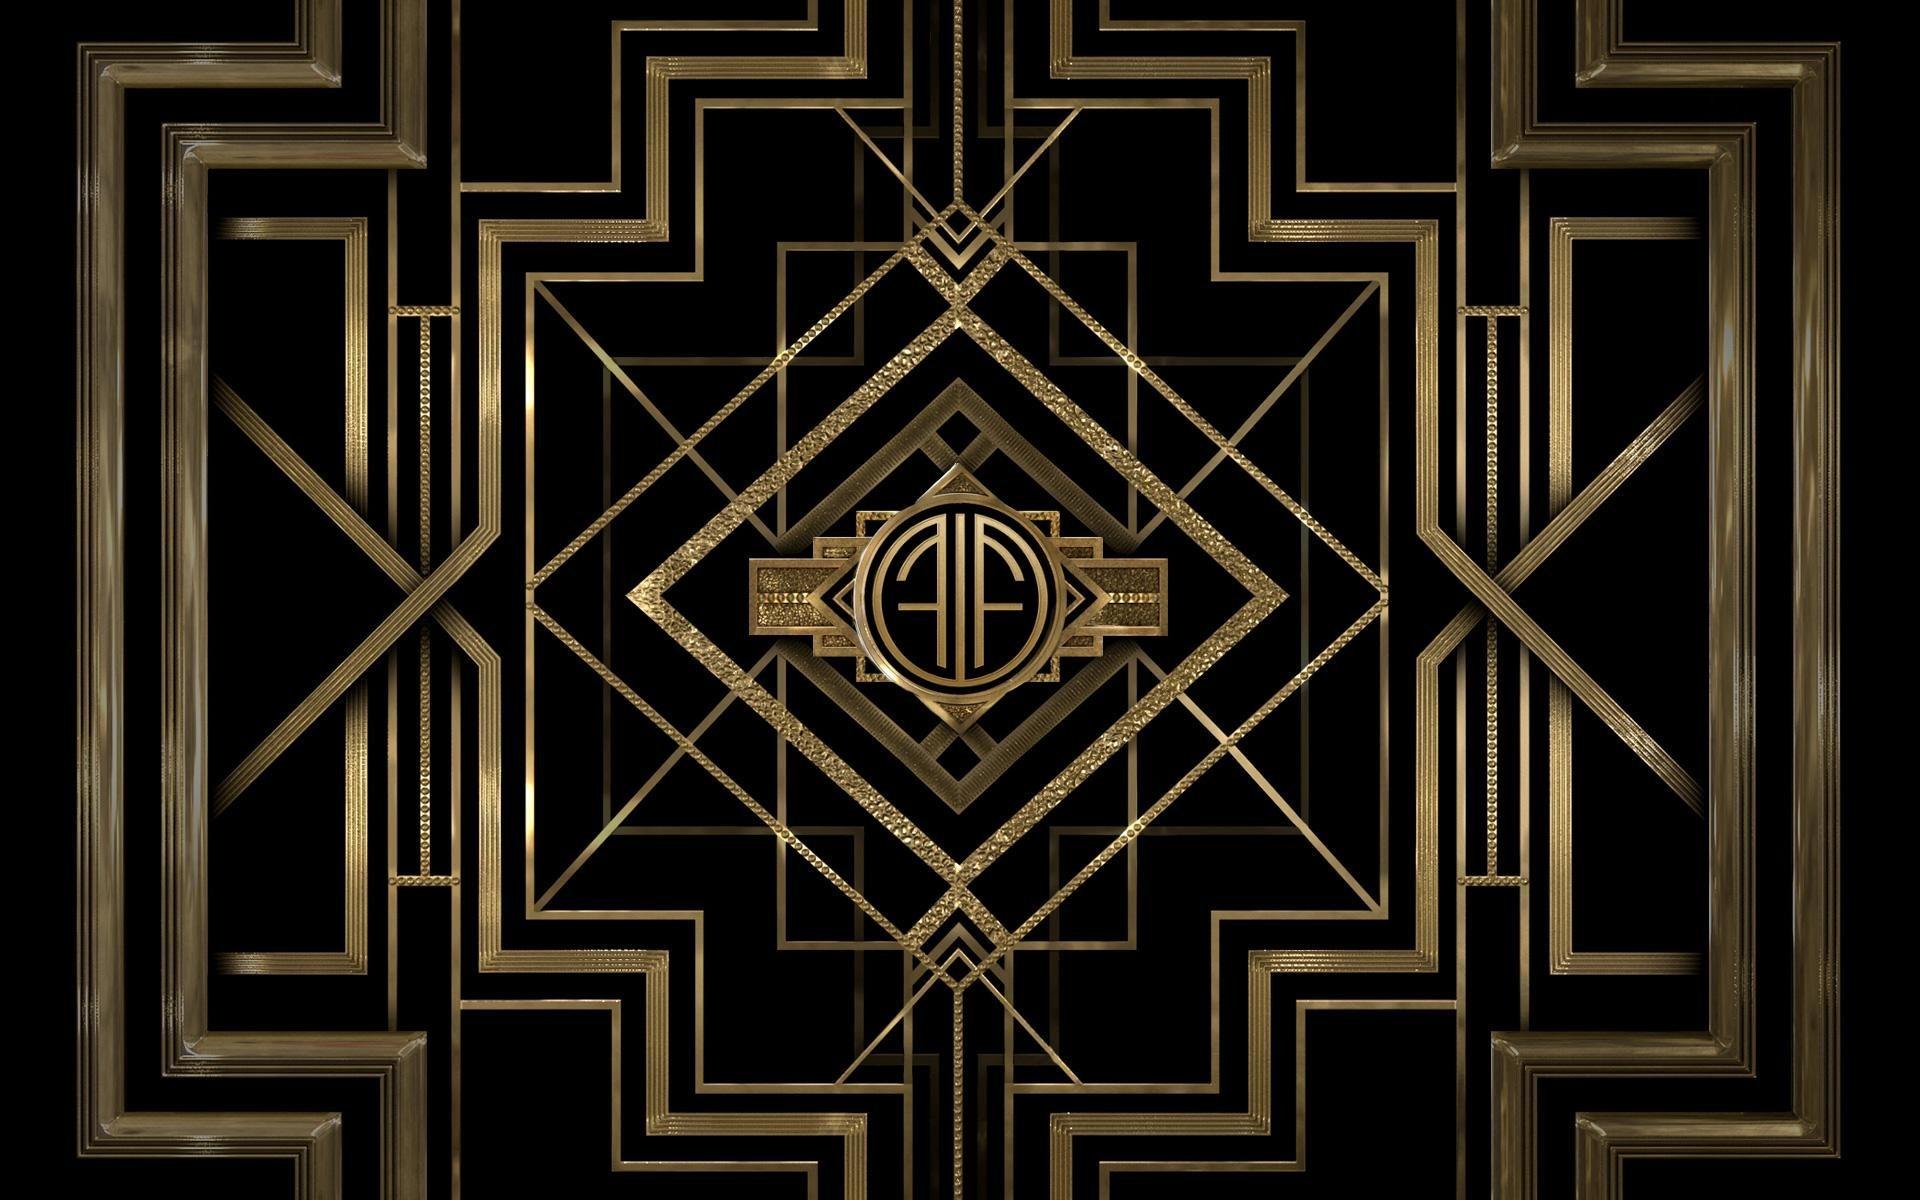 General 1920x1200 minimalism pattern digital art black gold The Great Gatsby Art Deco movie poster